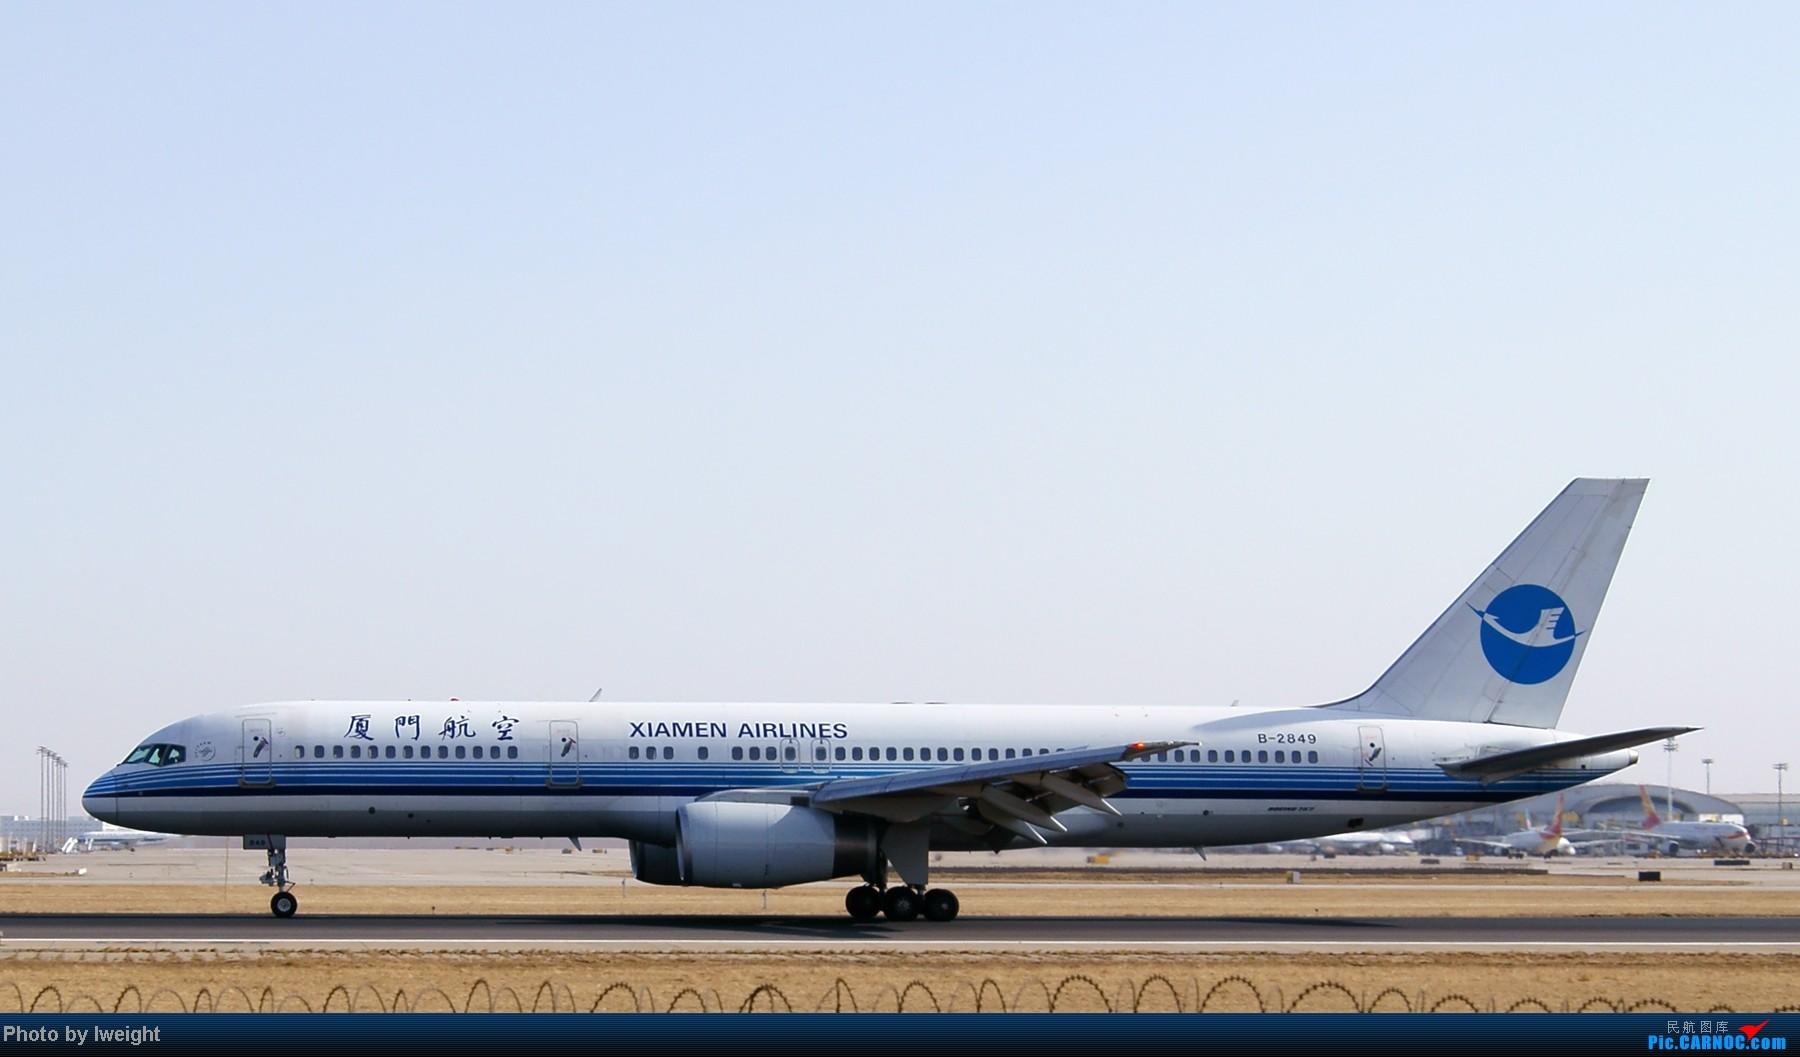 Re:[原创]春节期间首都机场拍机汇报 BOEING 757-200 B-2849 中国北京首都机场